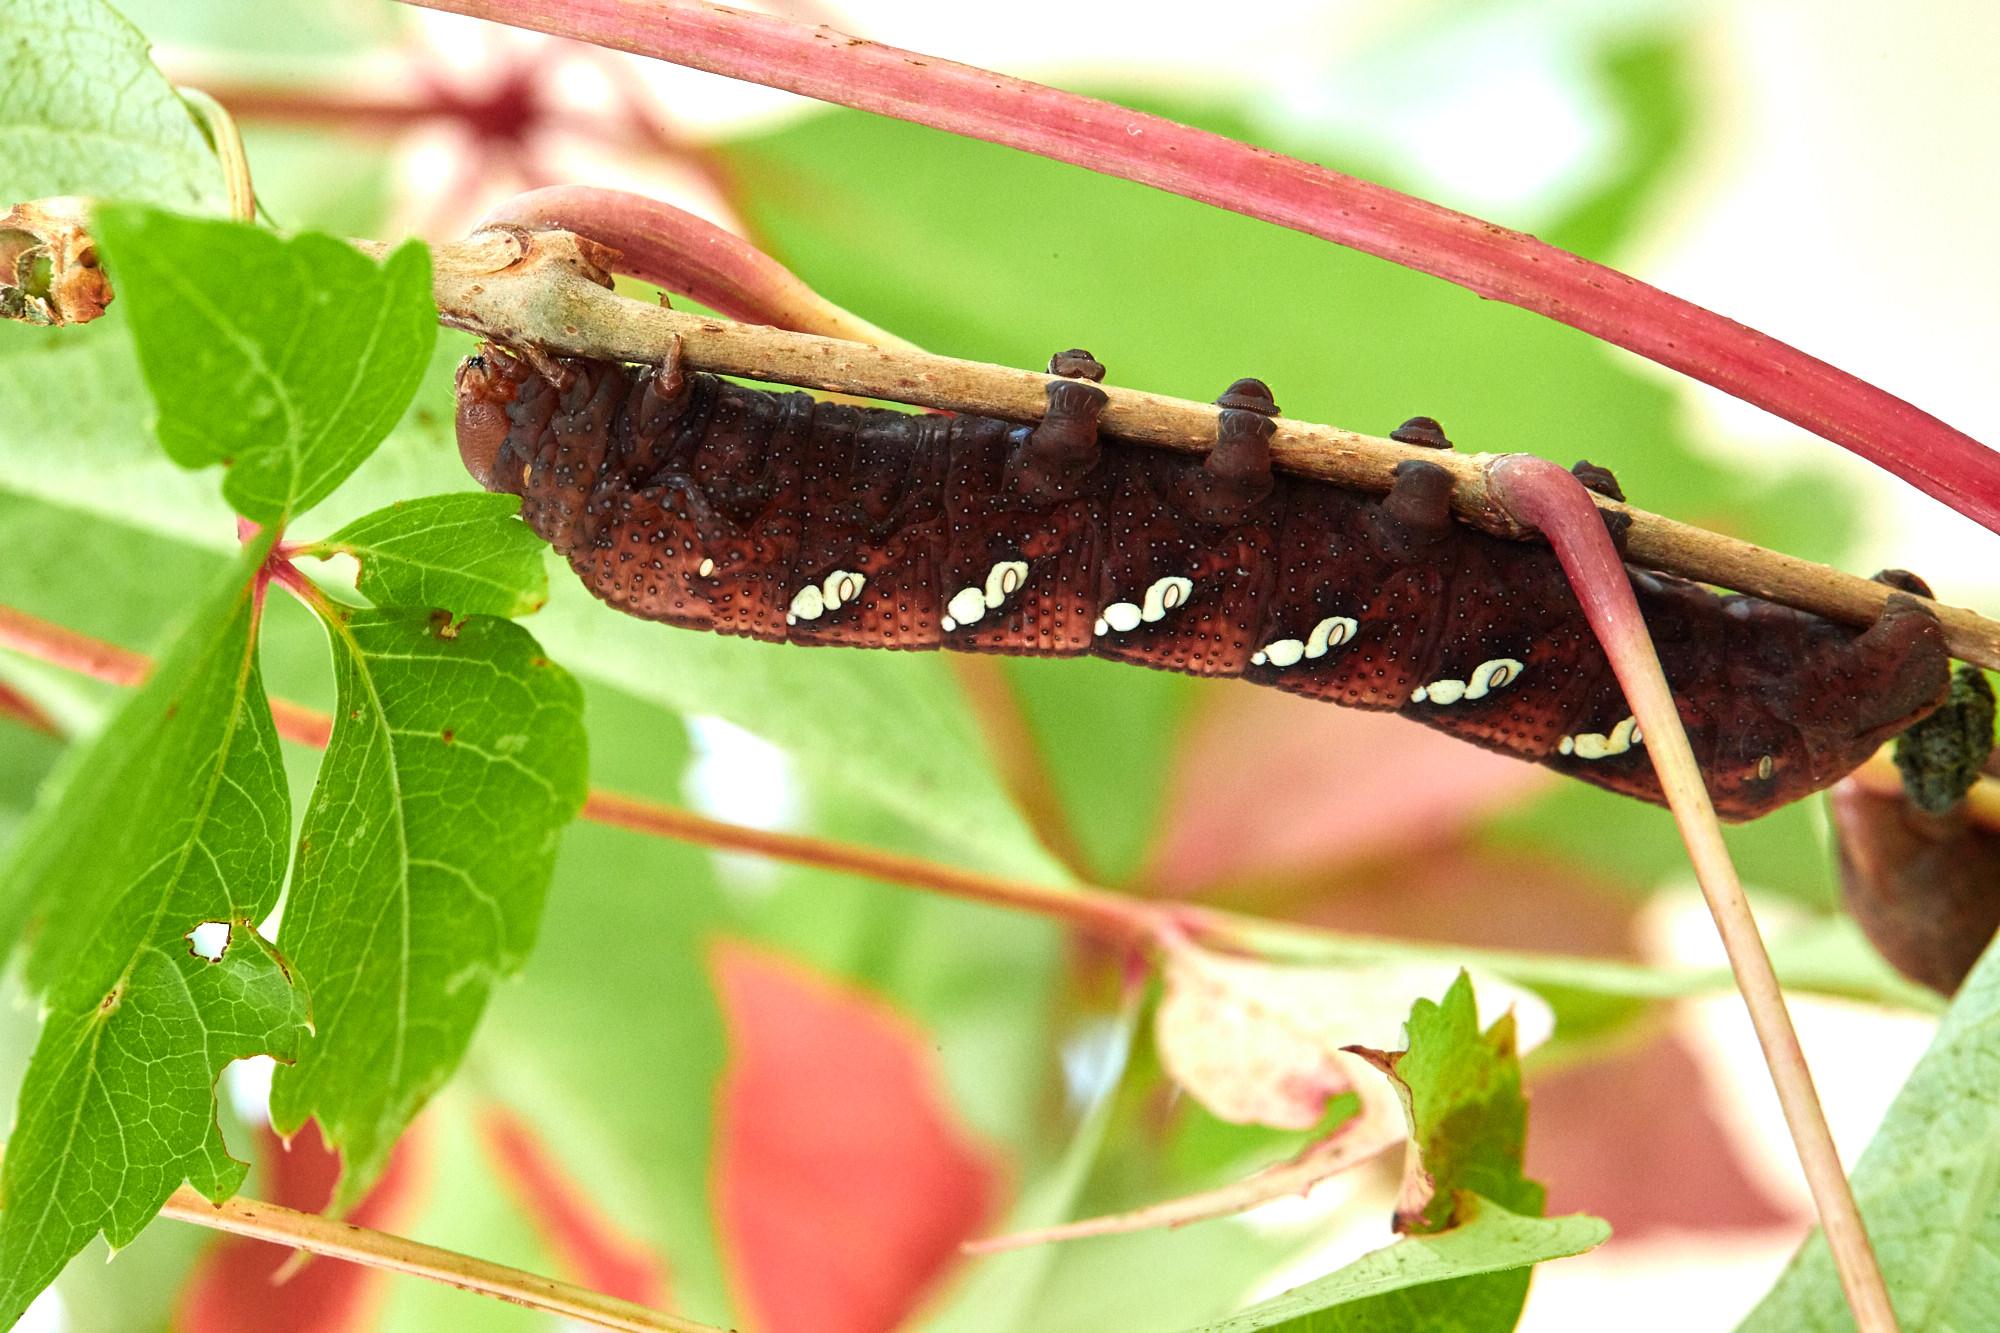 Caterpillars - 2016    - 40364- 000141.jpg